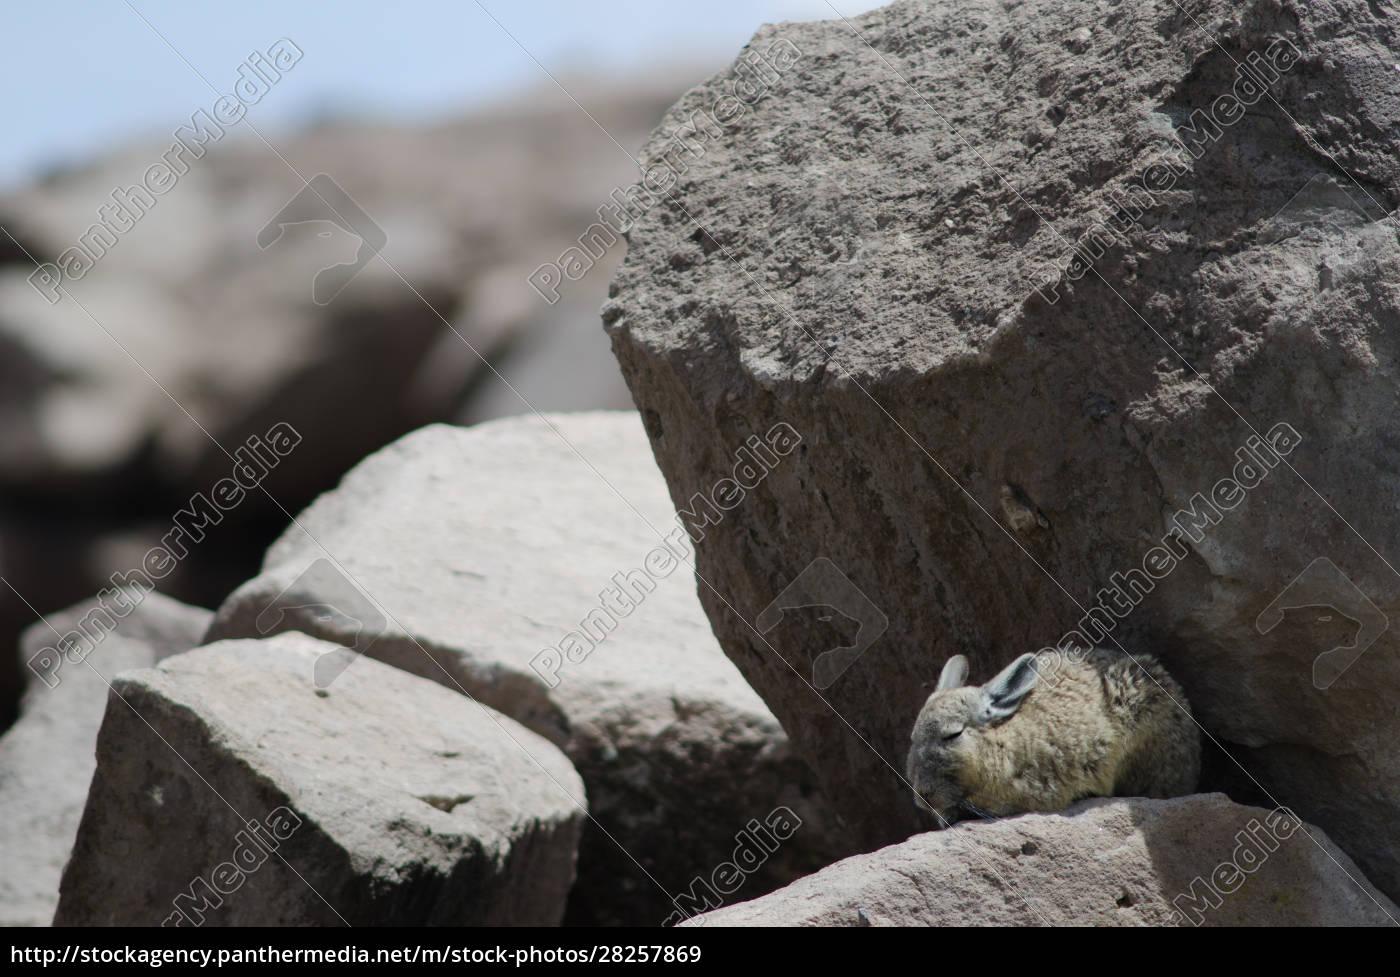 southern, viscacha, lagidium, viscacia, resting, between - 28257869